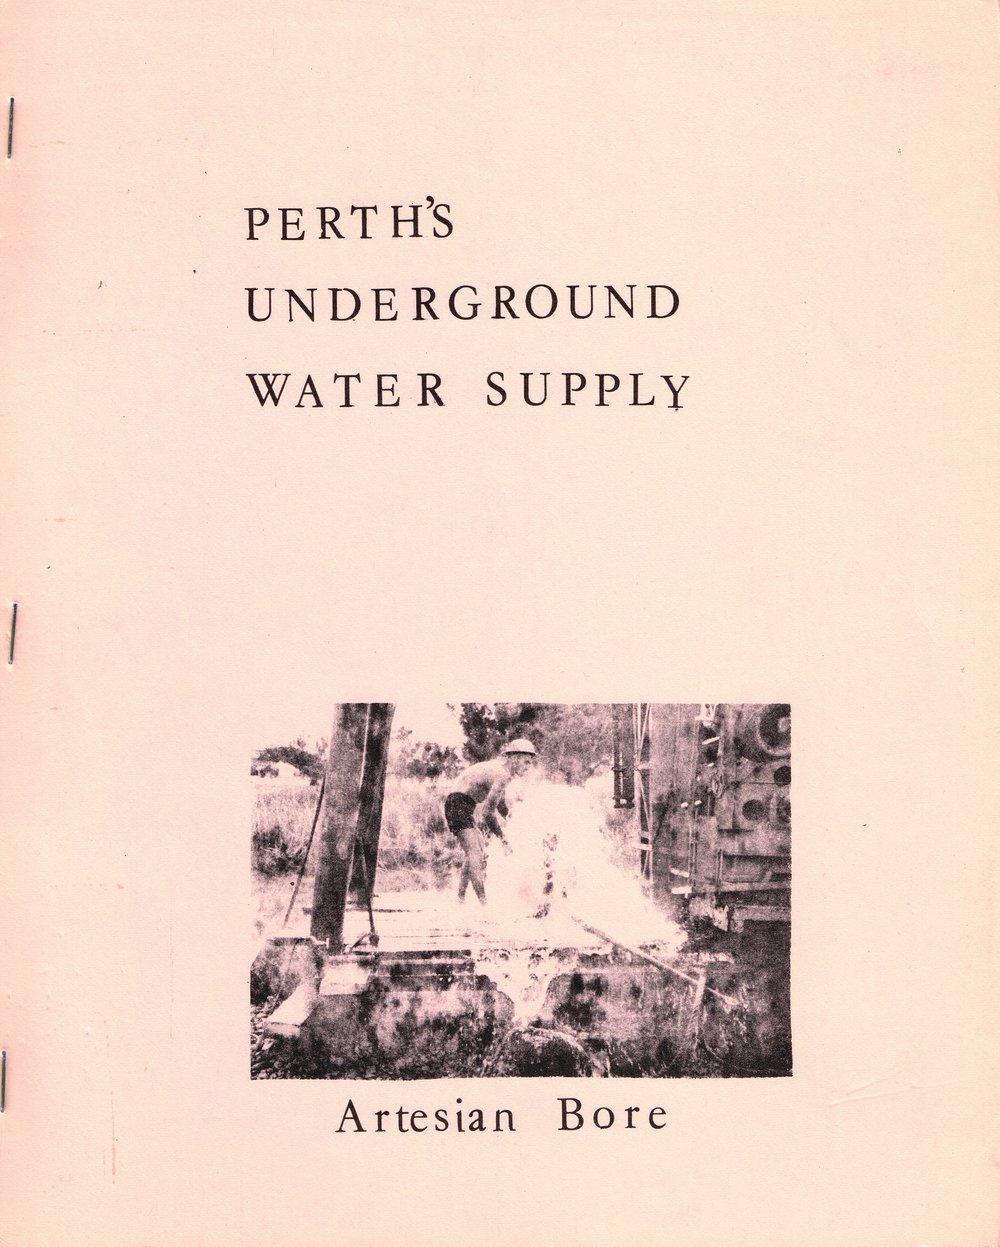 Perth's Underground Water Supply  Artesian Bore